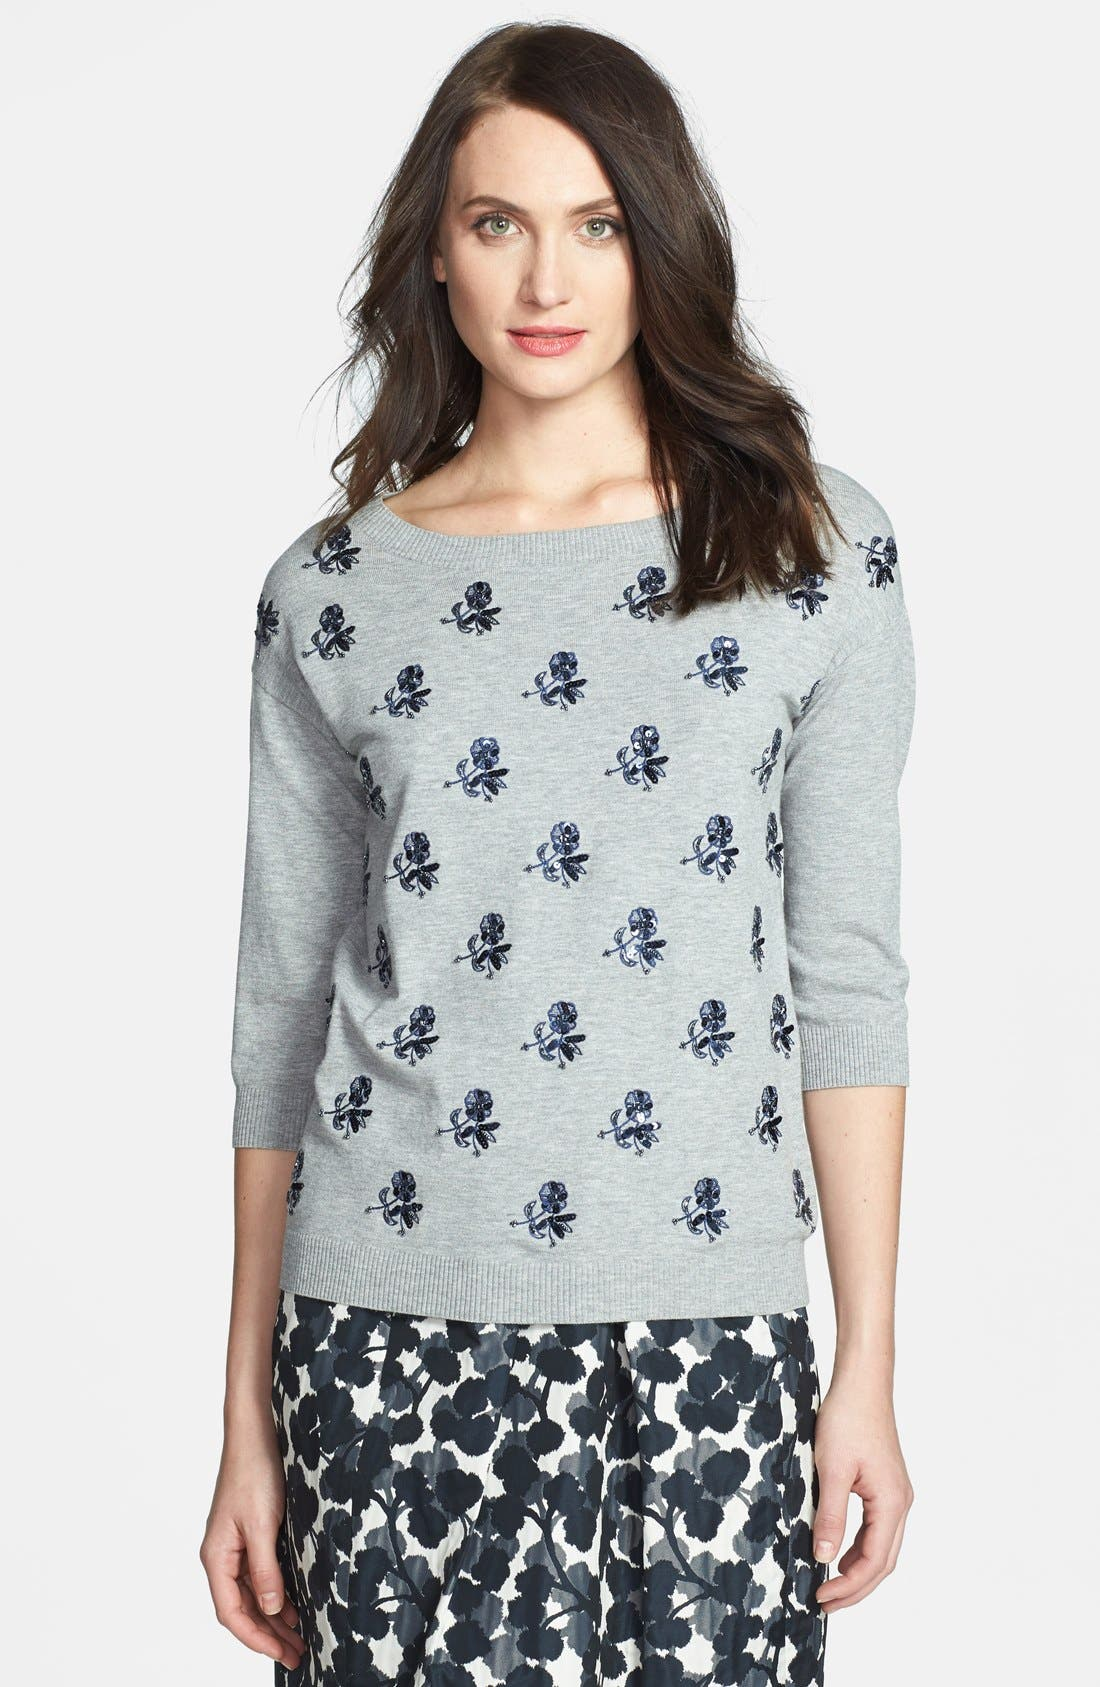 Main Image - Weekend Max Mara 'Pandora' Sequin Embroidered Sweater